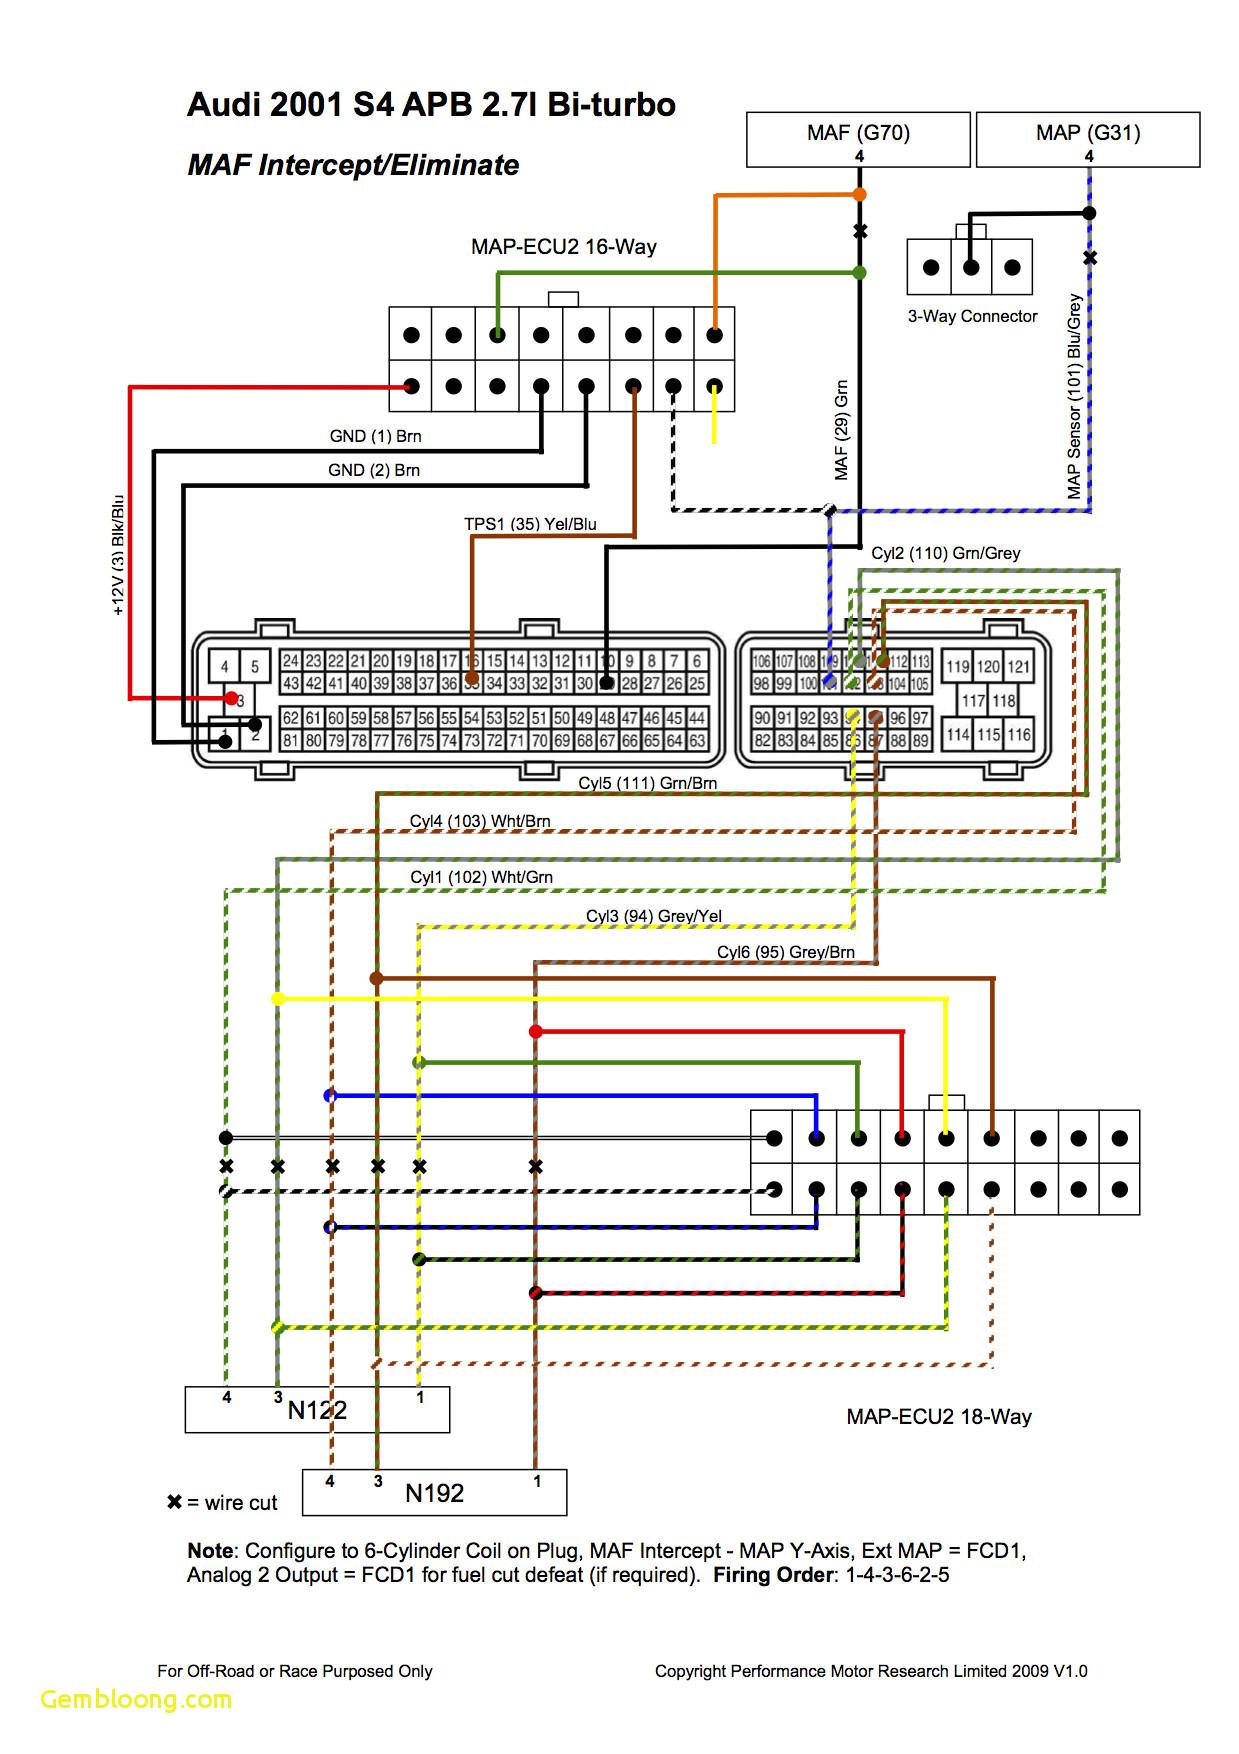 1999 honda accord ecu pin wiring diagram wiring diagram 2012 honda civic obd connector fuse further dodge dakota radio wiring